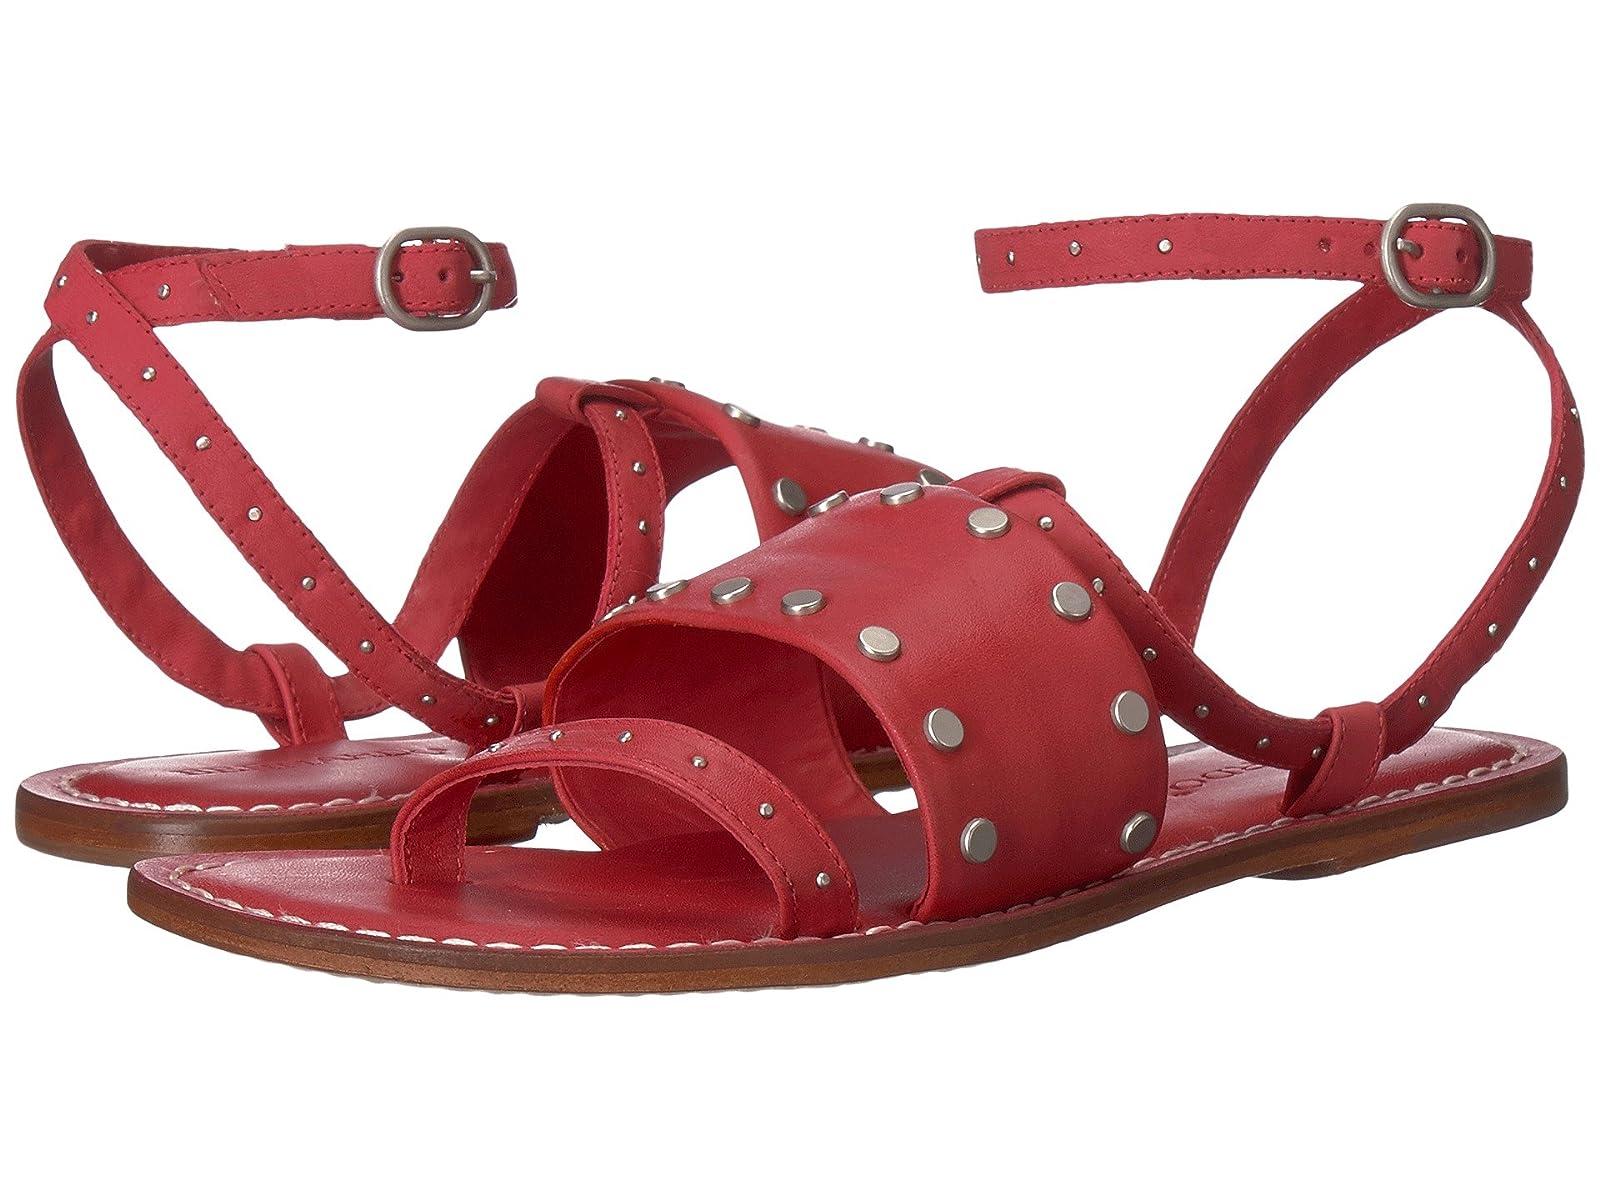 Bernardo Maisa SandalCheap and distinctive eye-catching shoes